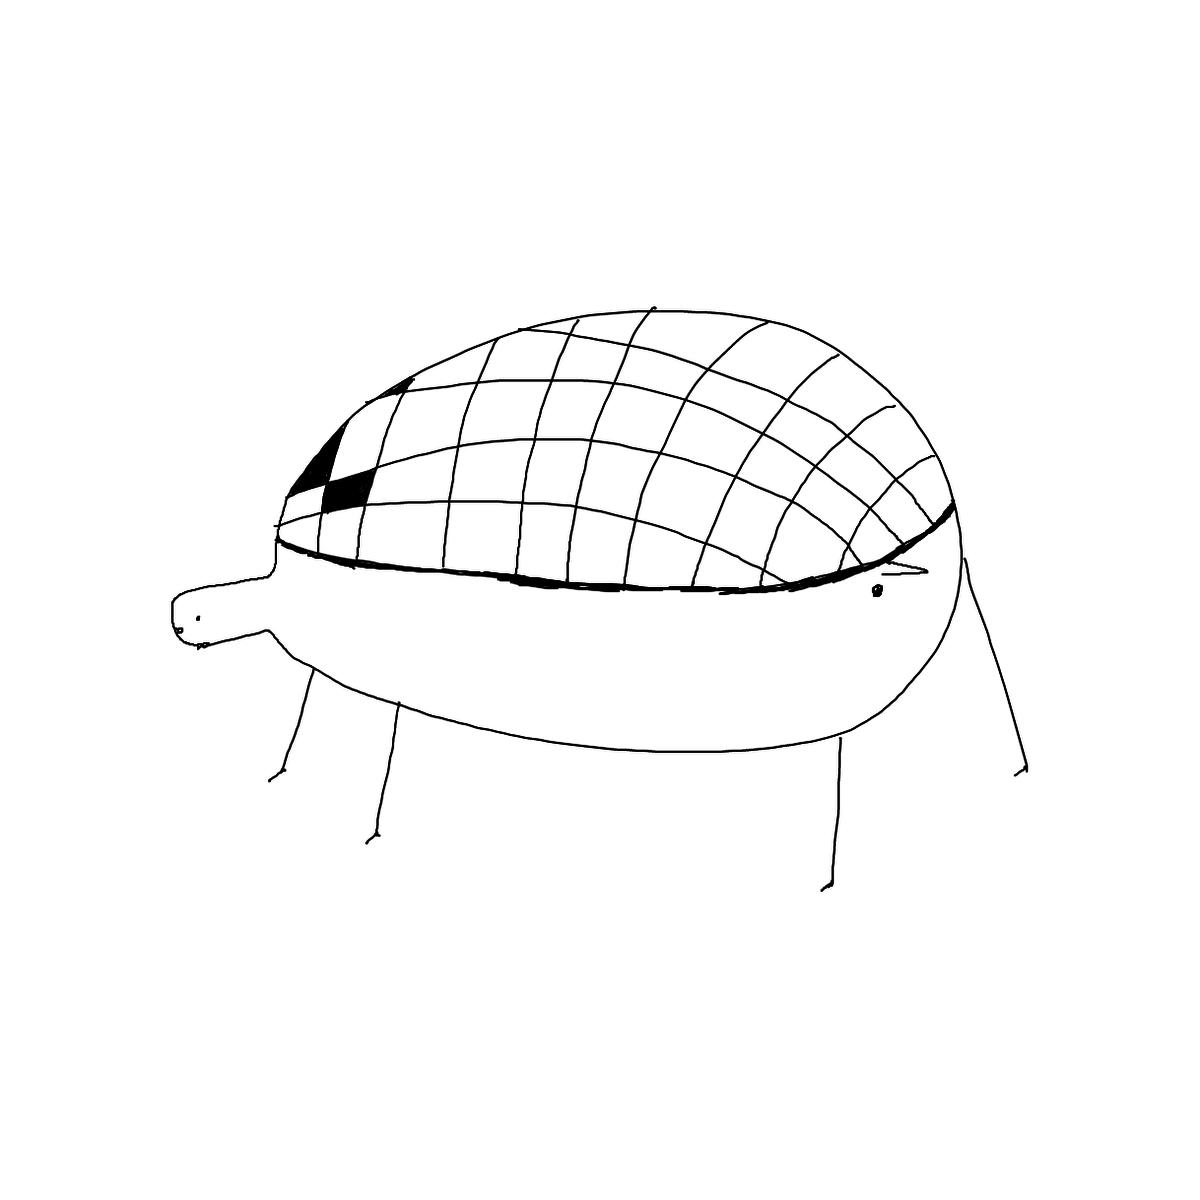 BAAAM drawing#4169 lat:52.4748878479003900lng: 13.4071245193481450